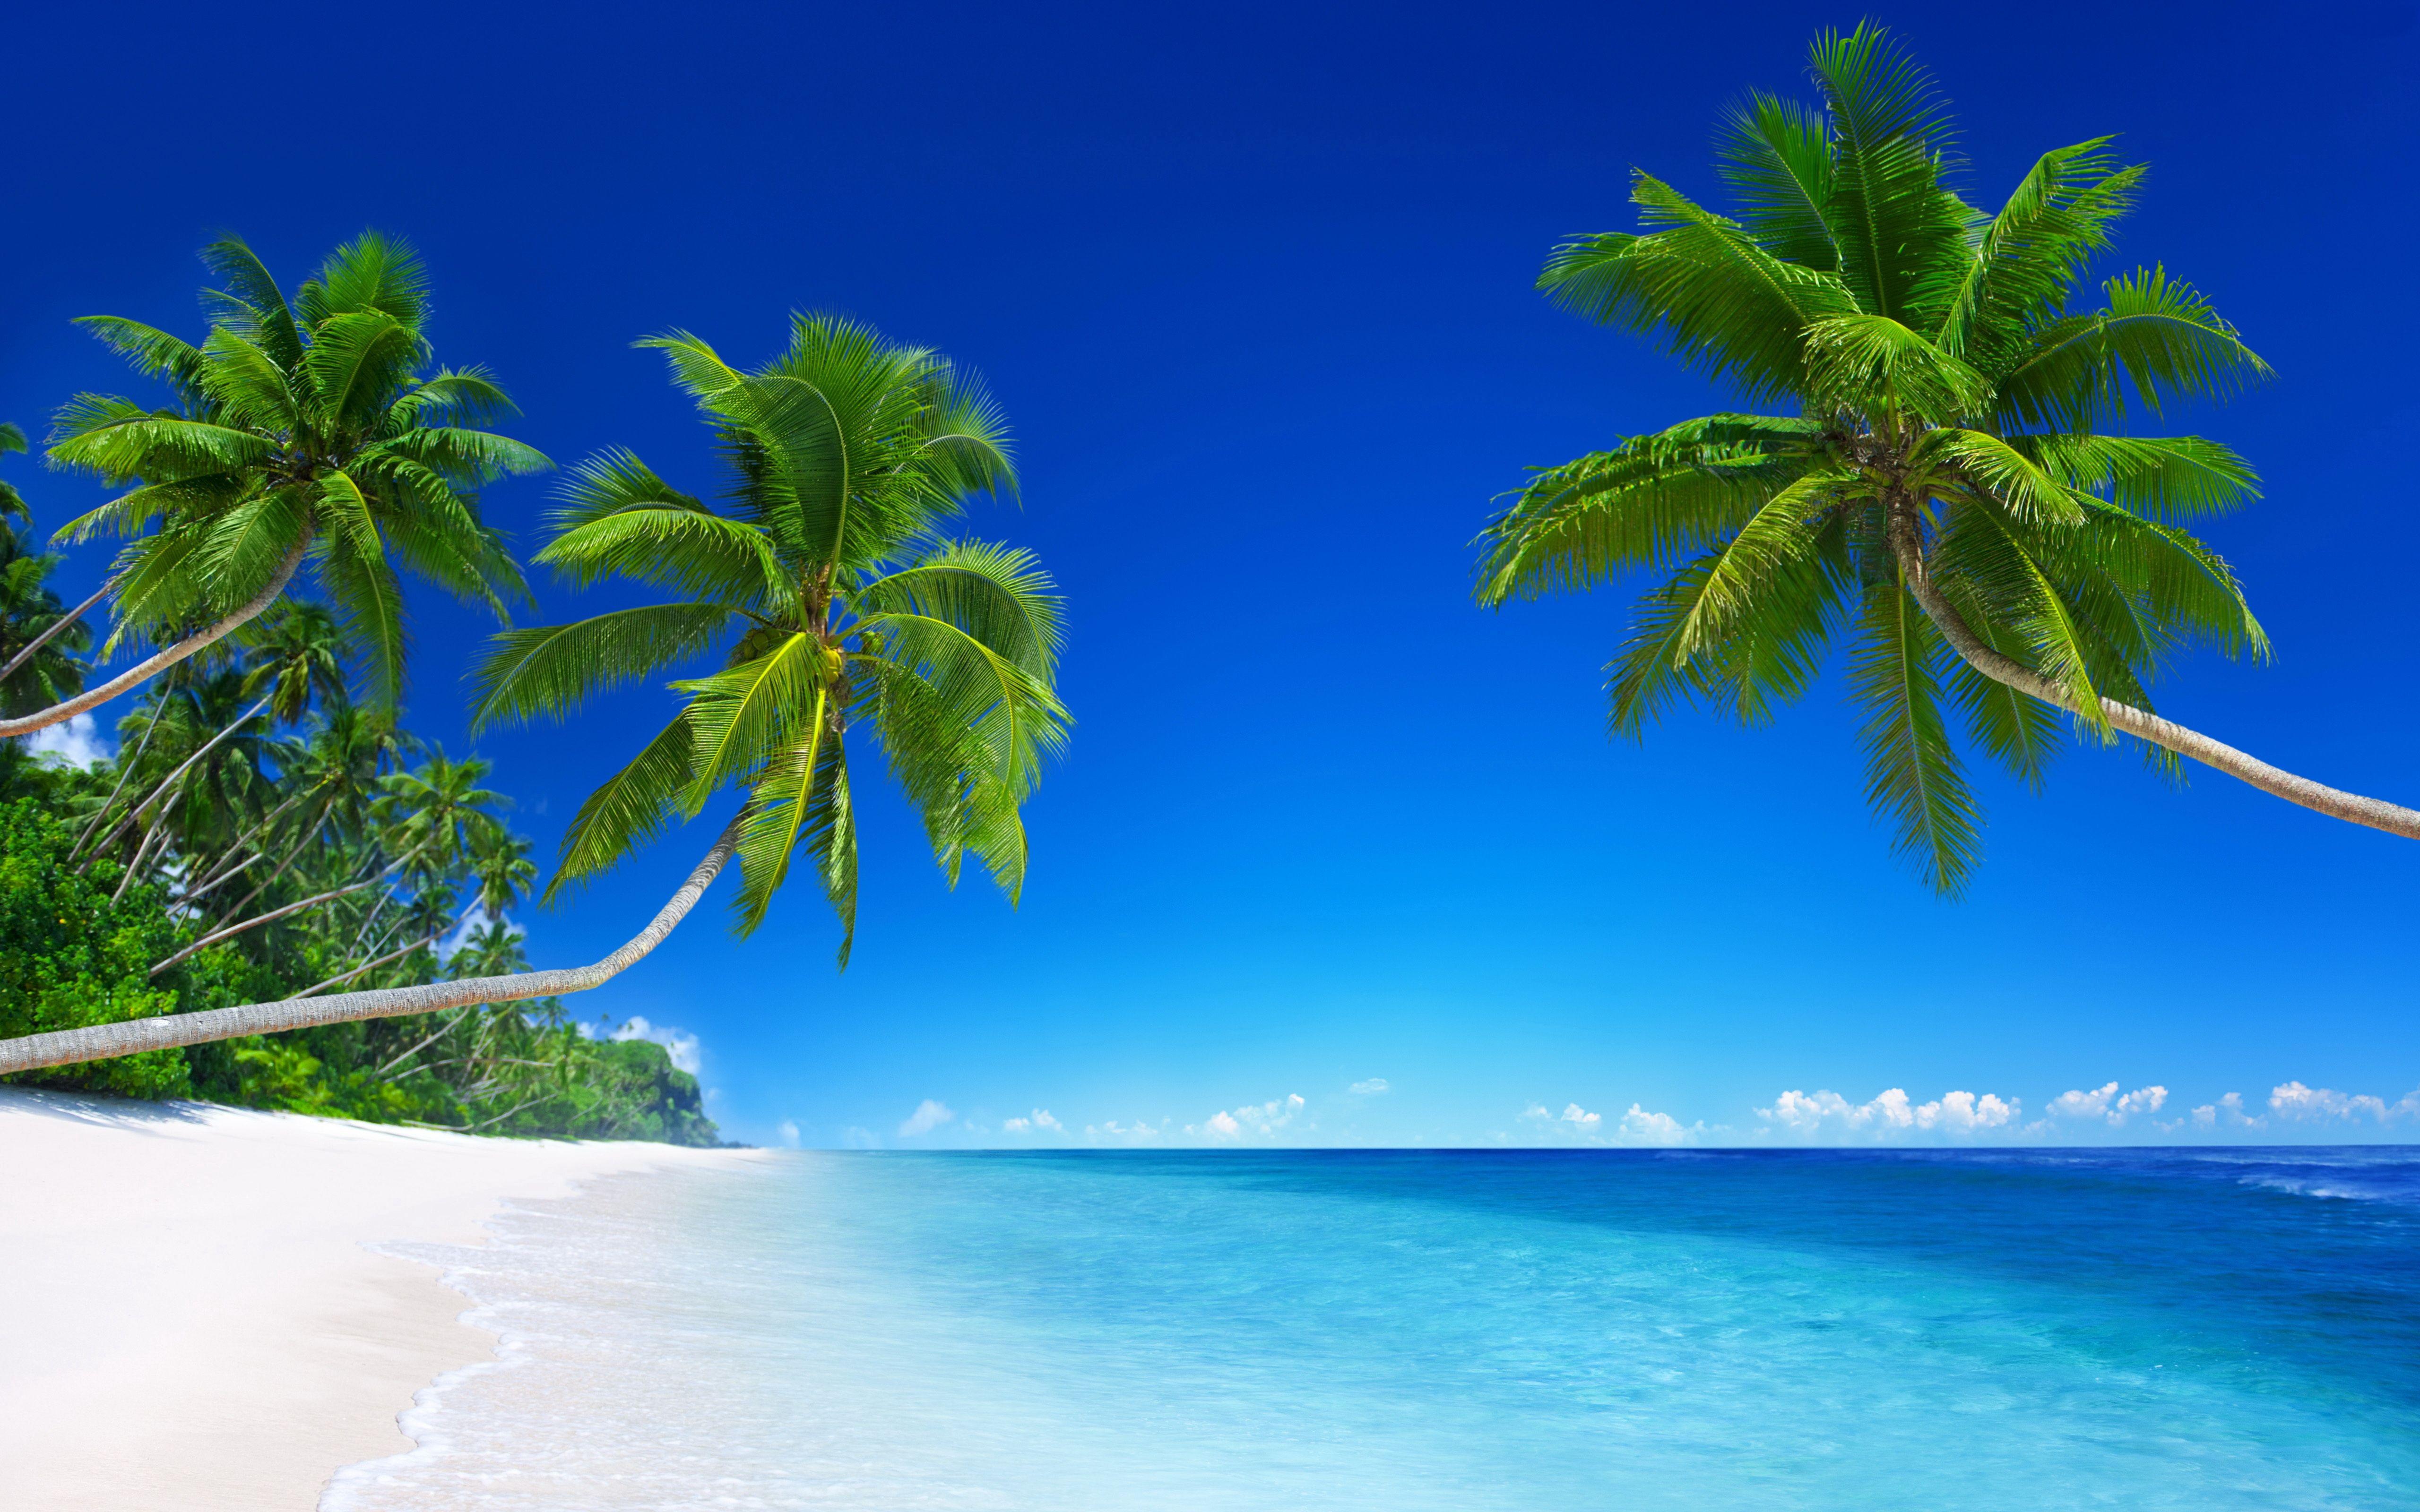 sensational island wallpaper for your desktop naldz graphics desktop backgrounds